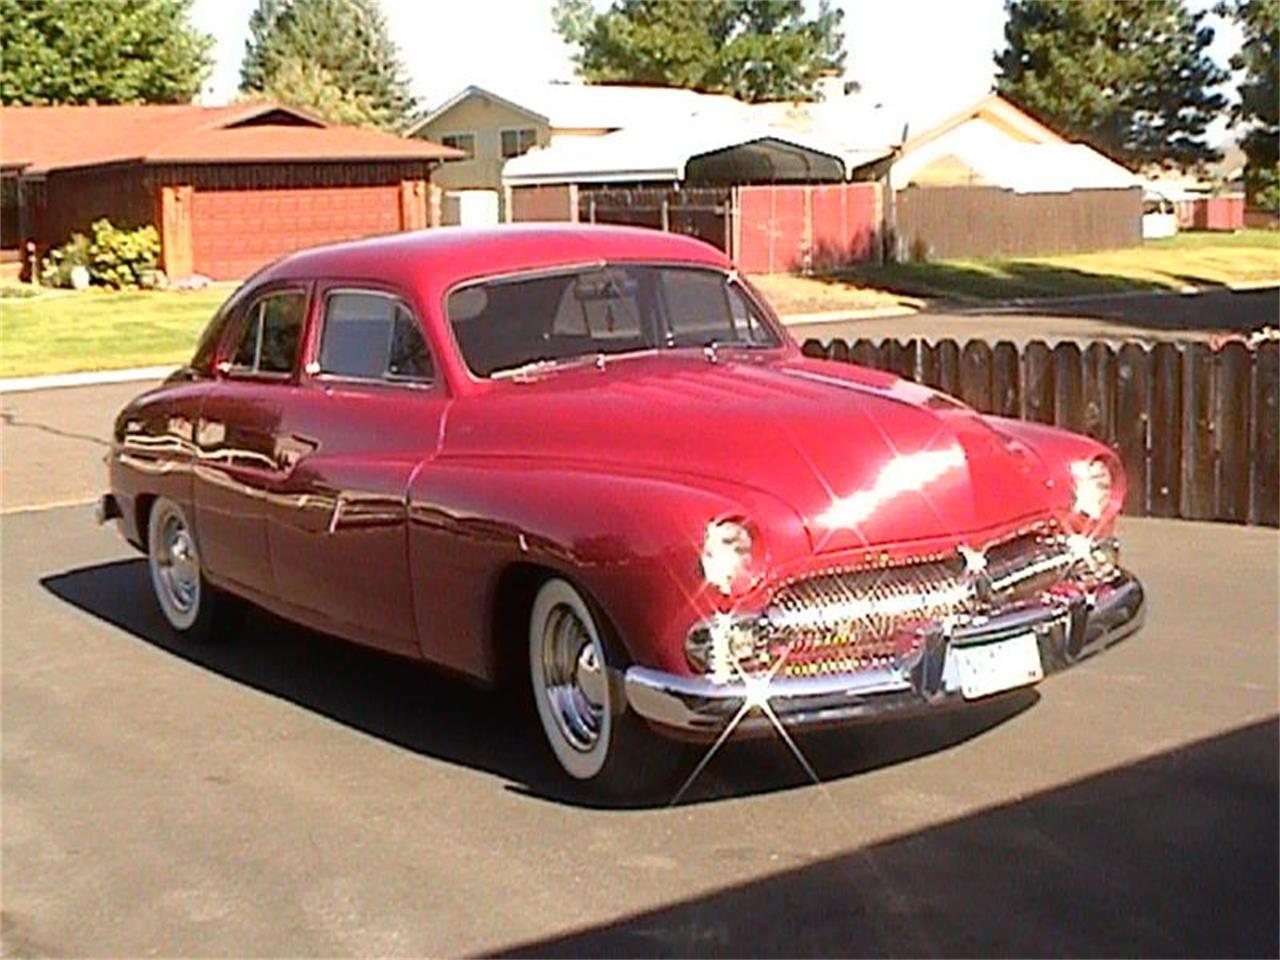 Large Picture of Classic 1950 Mercury 4-Dr Sedan - $40,700.00 - EAIC